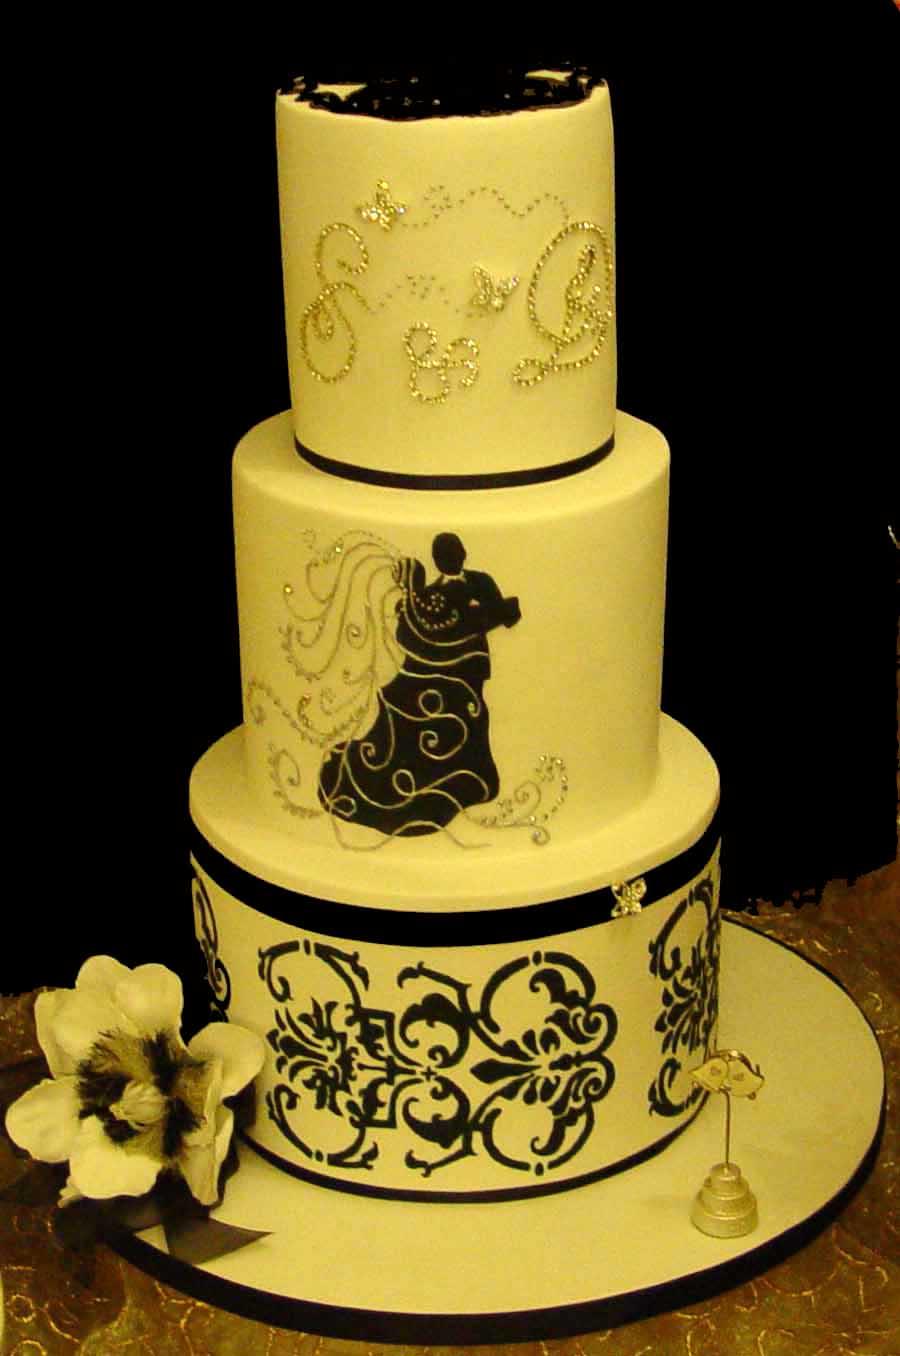 Crumbs Cake Art Facebook : Crumbs! @ the Aust Bridal Show Crumbs Cake Art - Amazing ...